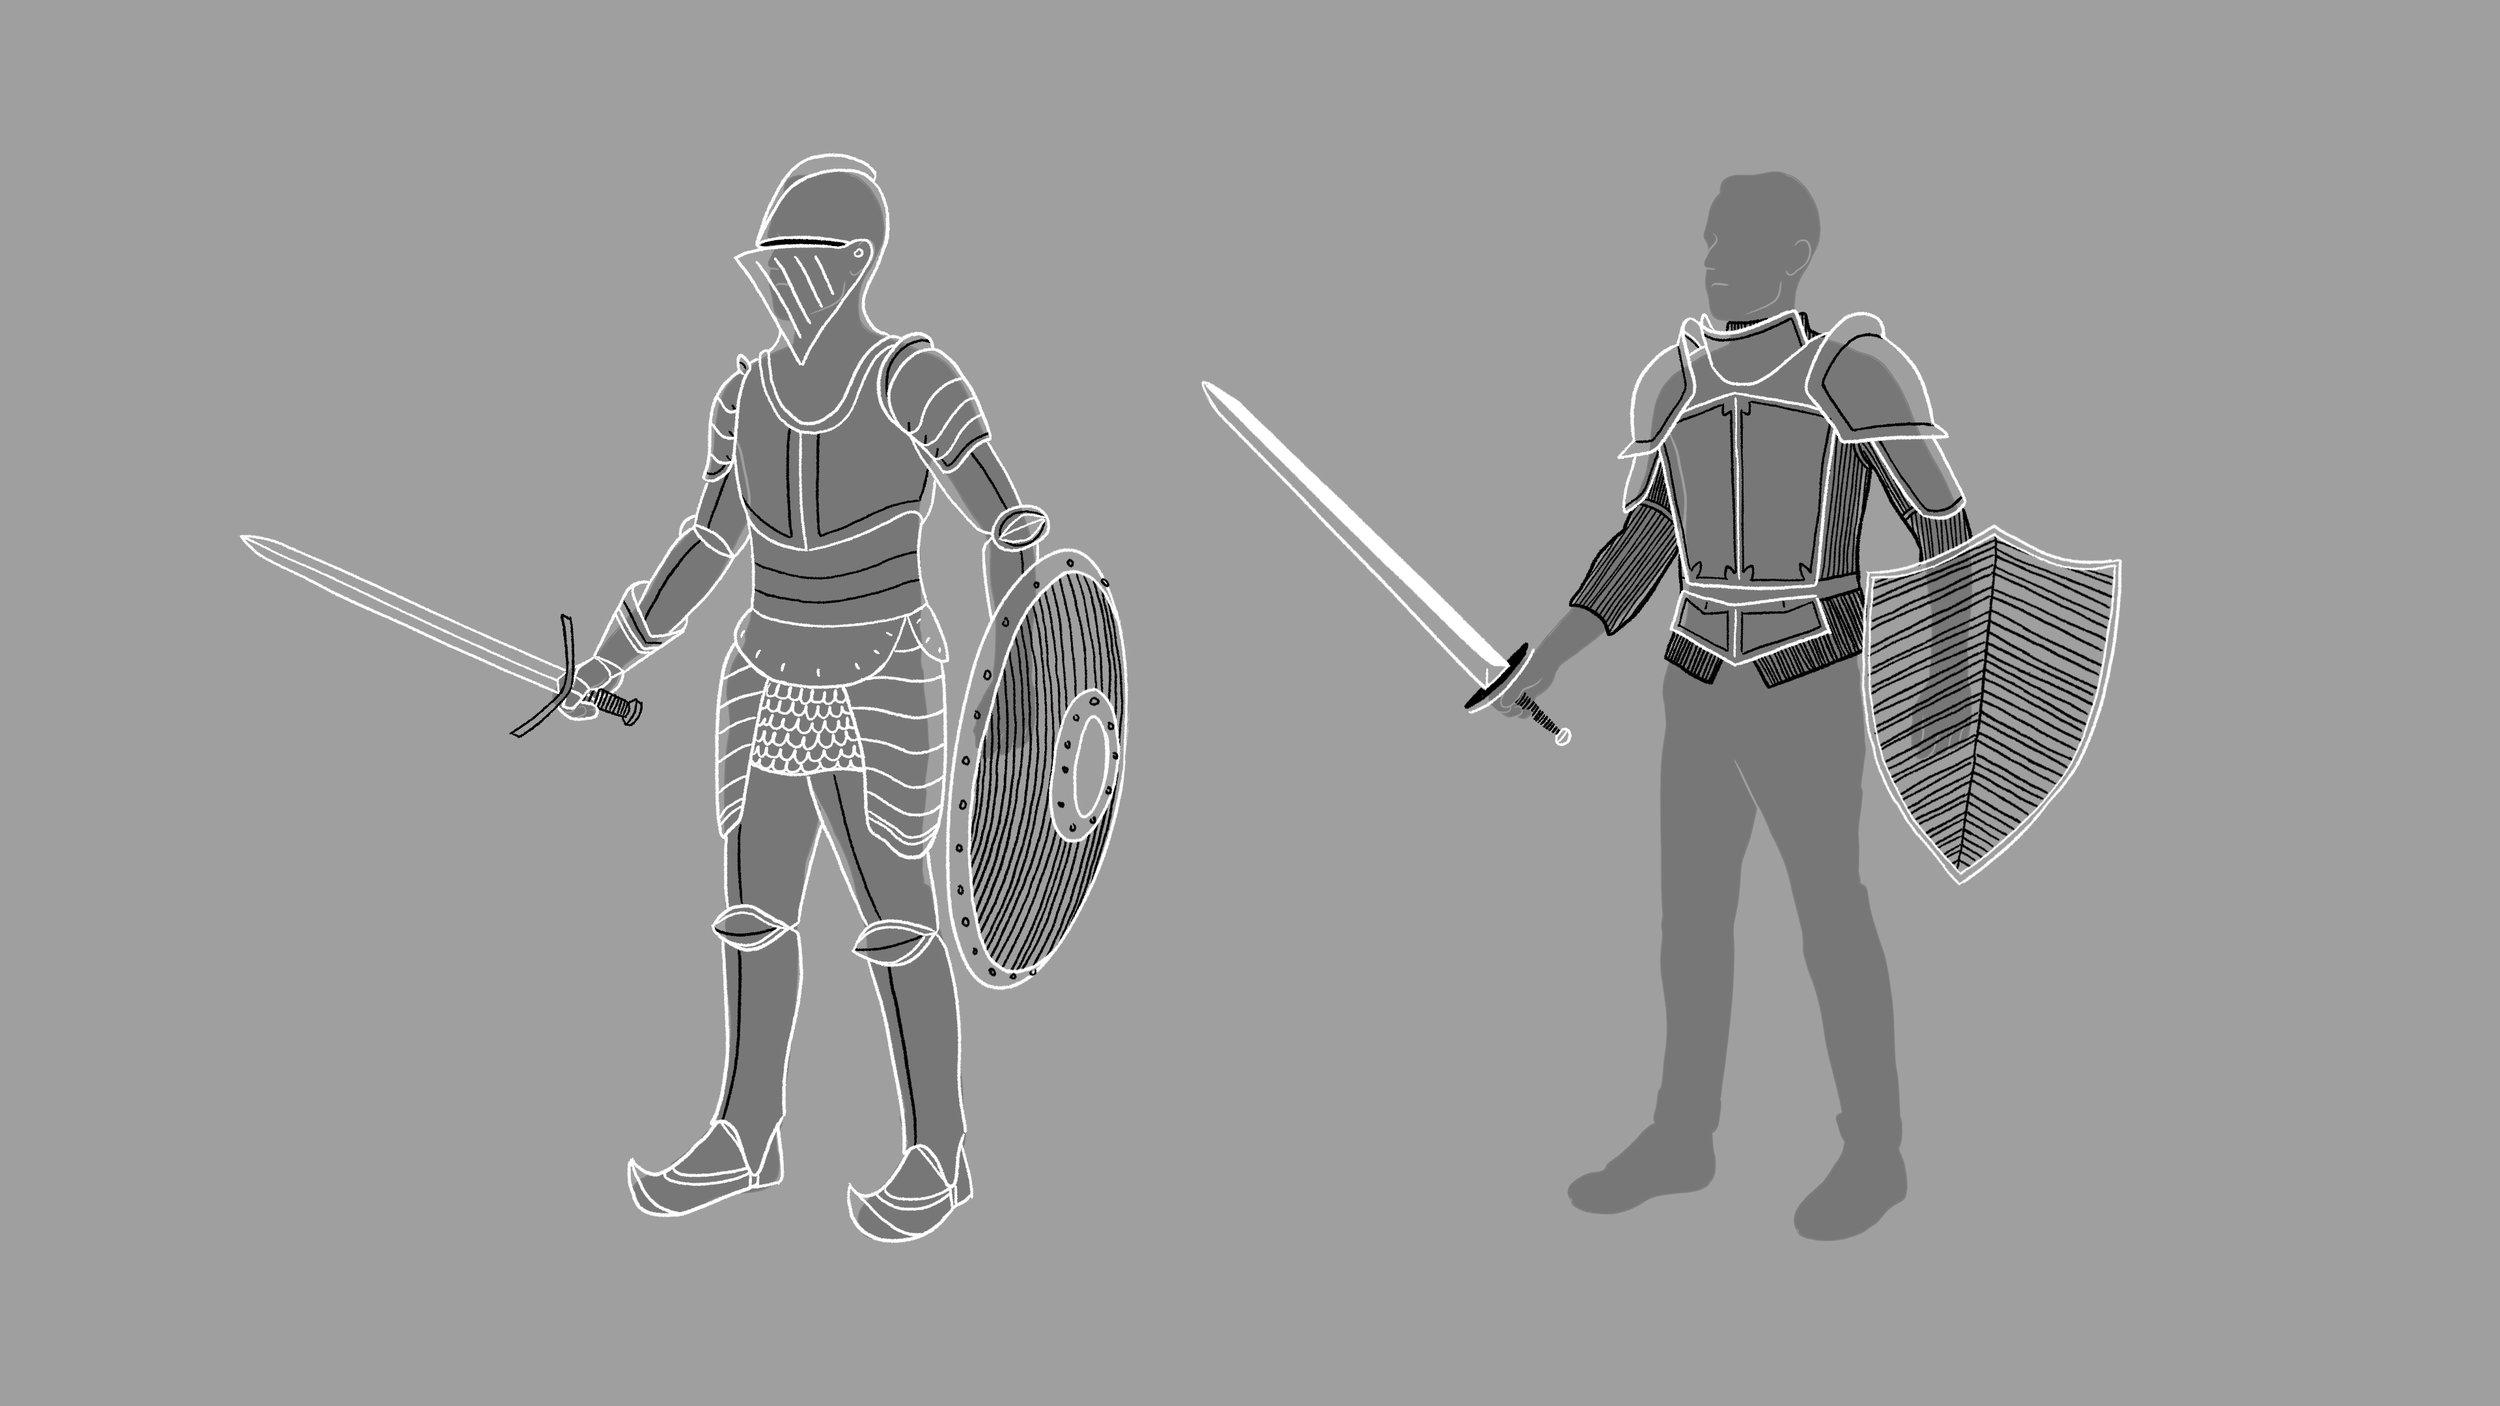 Knights_A_007.jpg